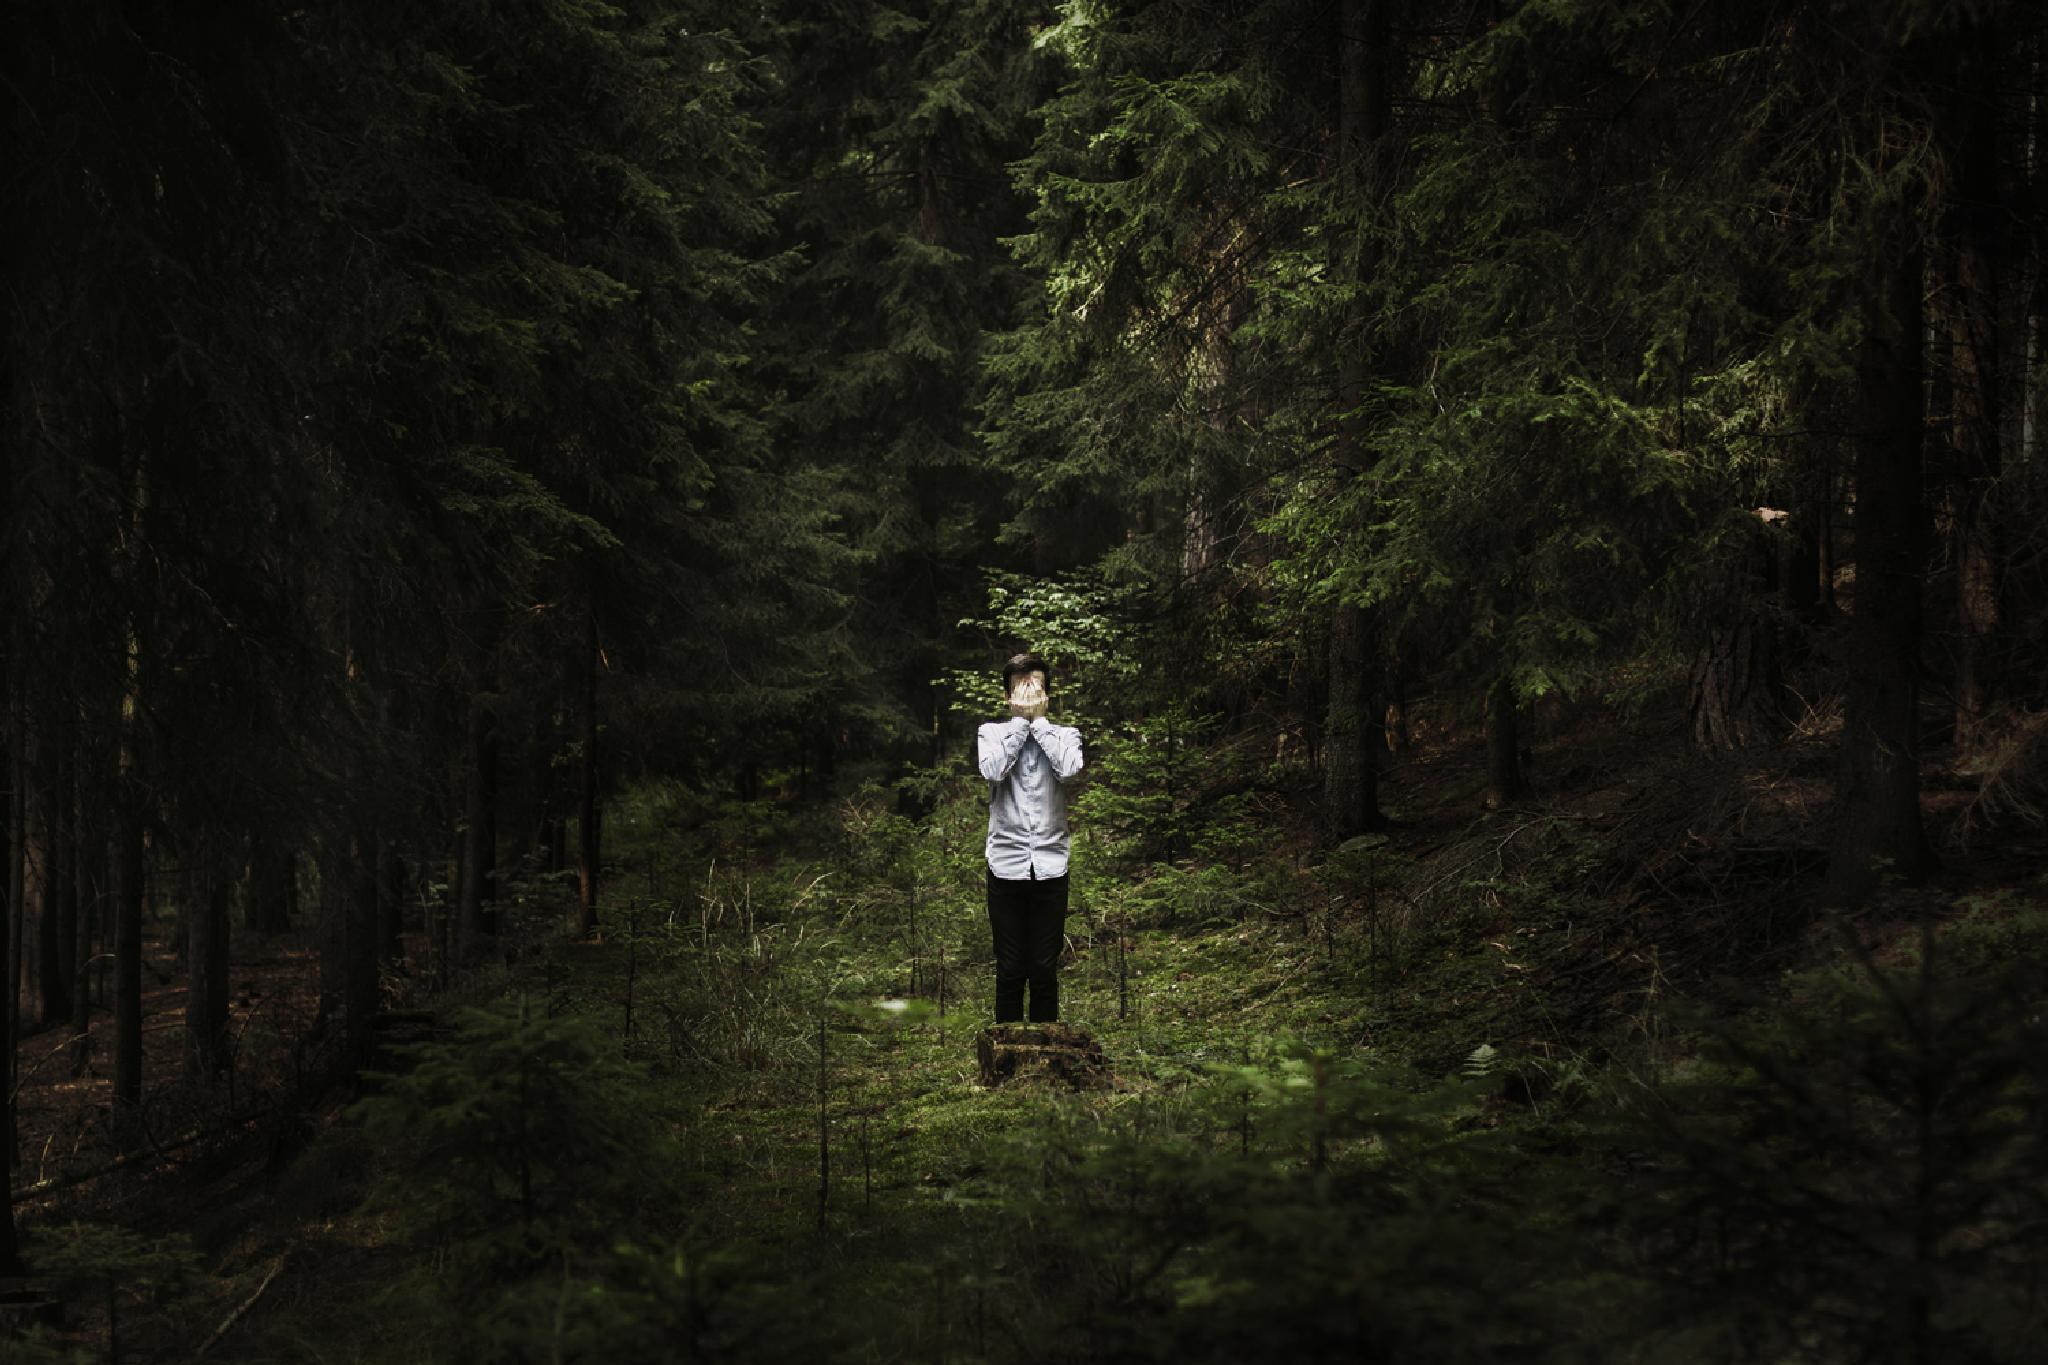 Lost in forest by Milan Vopalensky